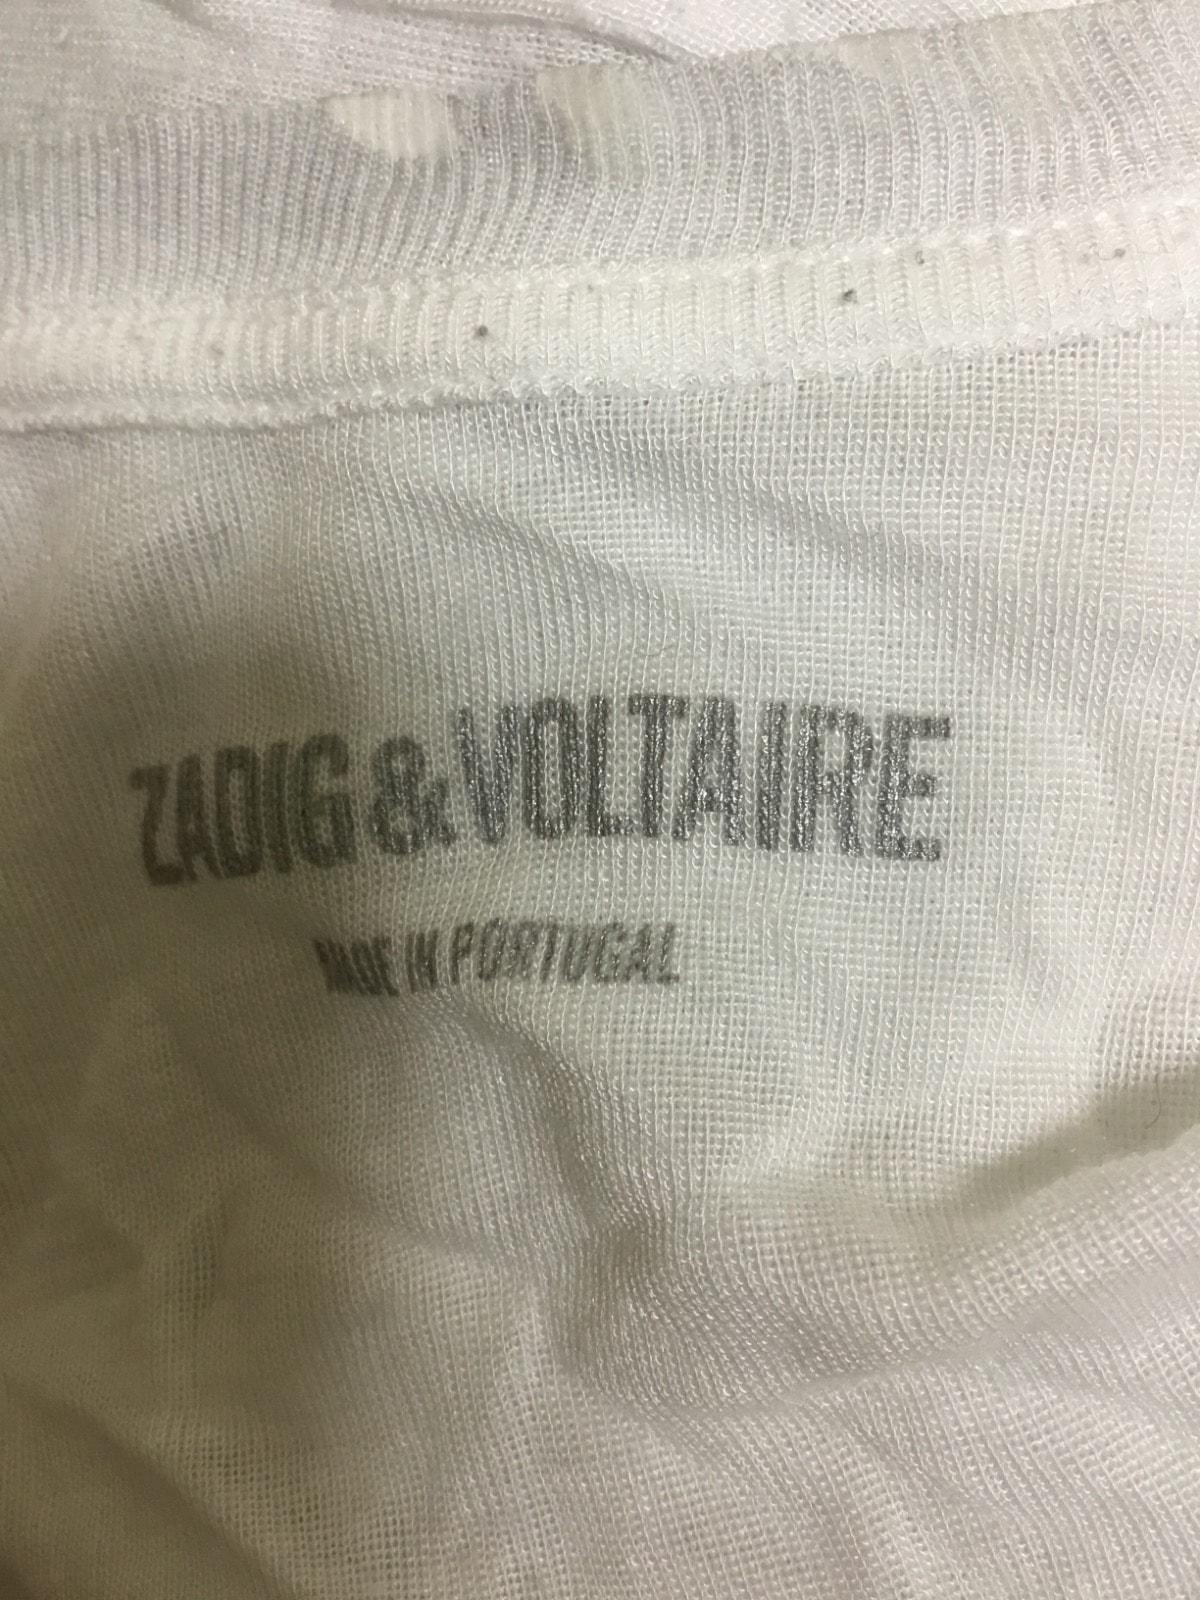 Zadig&Voltaire(ザディグエヴォルテール)のタンクトップ